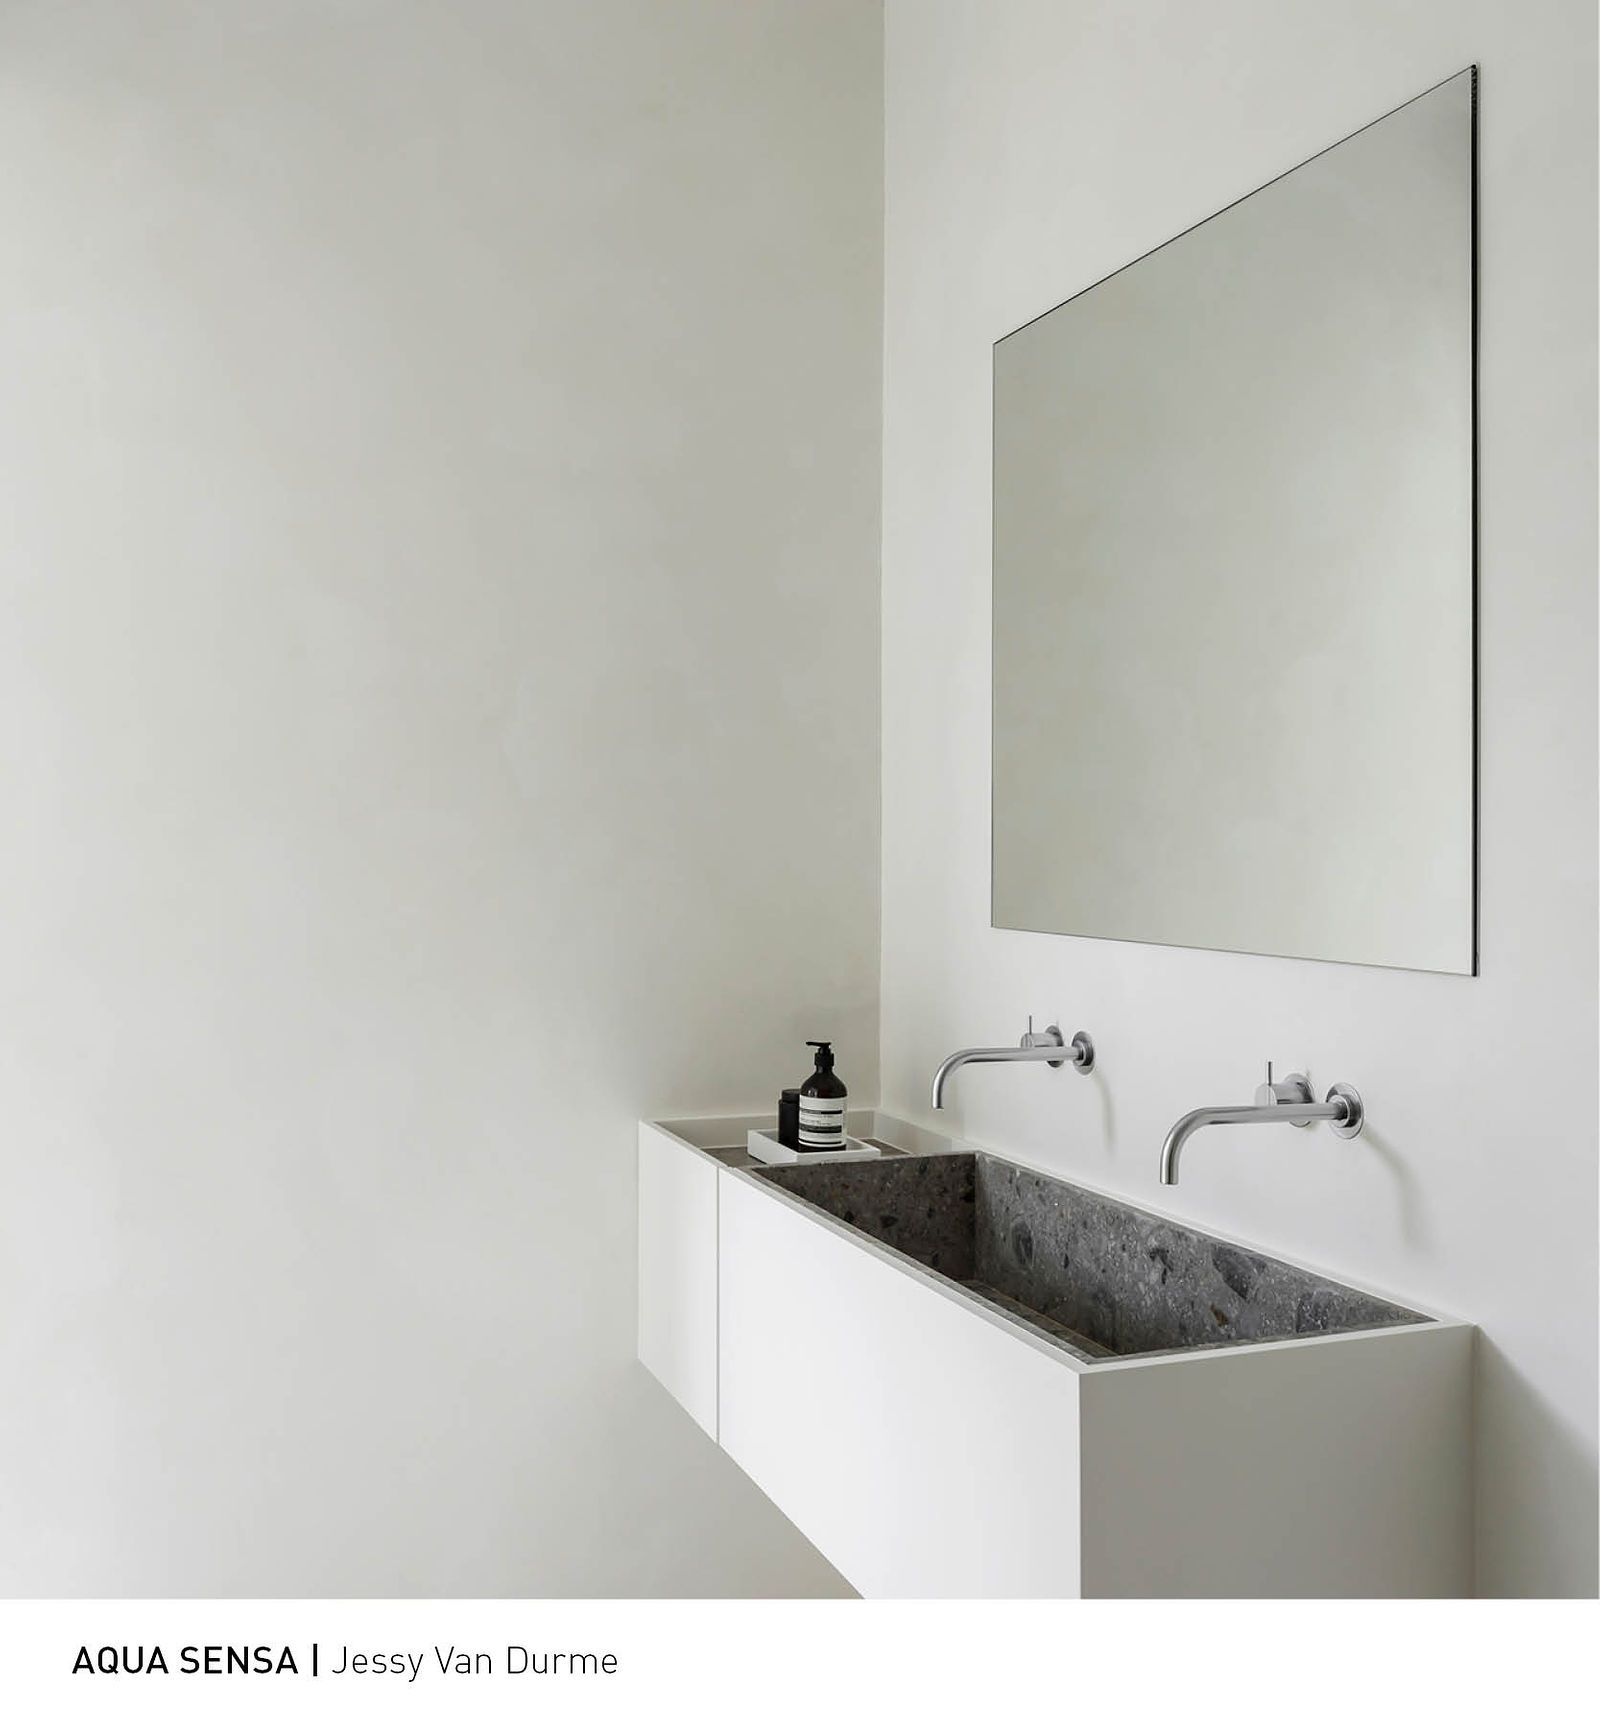 Aqua Sensa By Homepage In 2020 Sensa Aqua Home